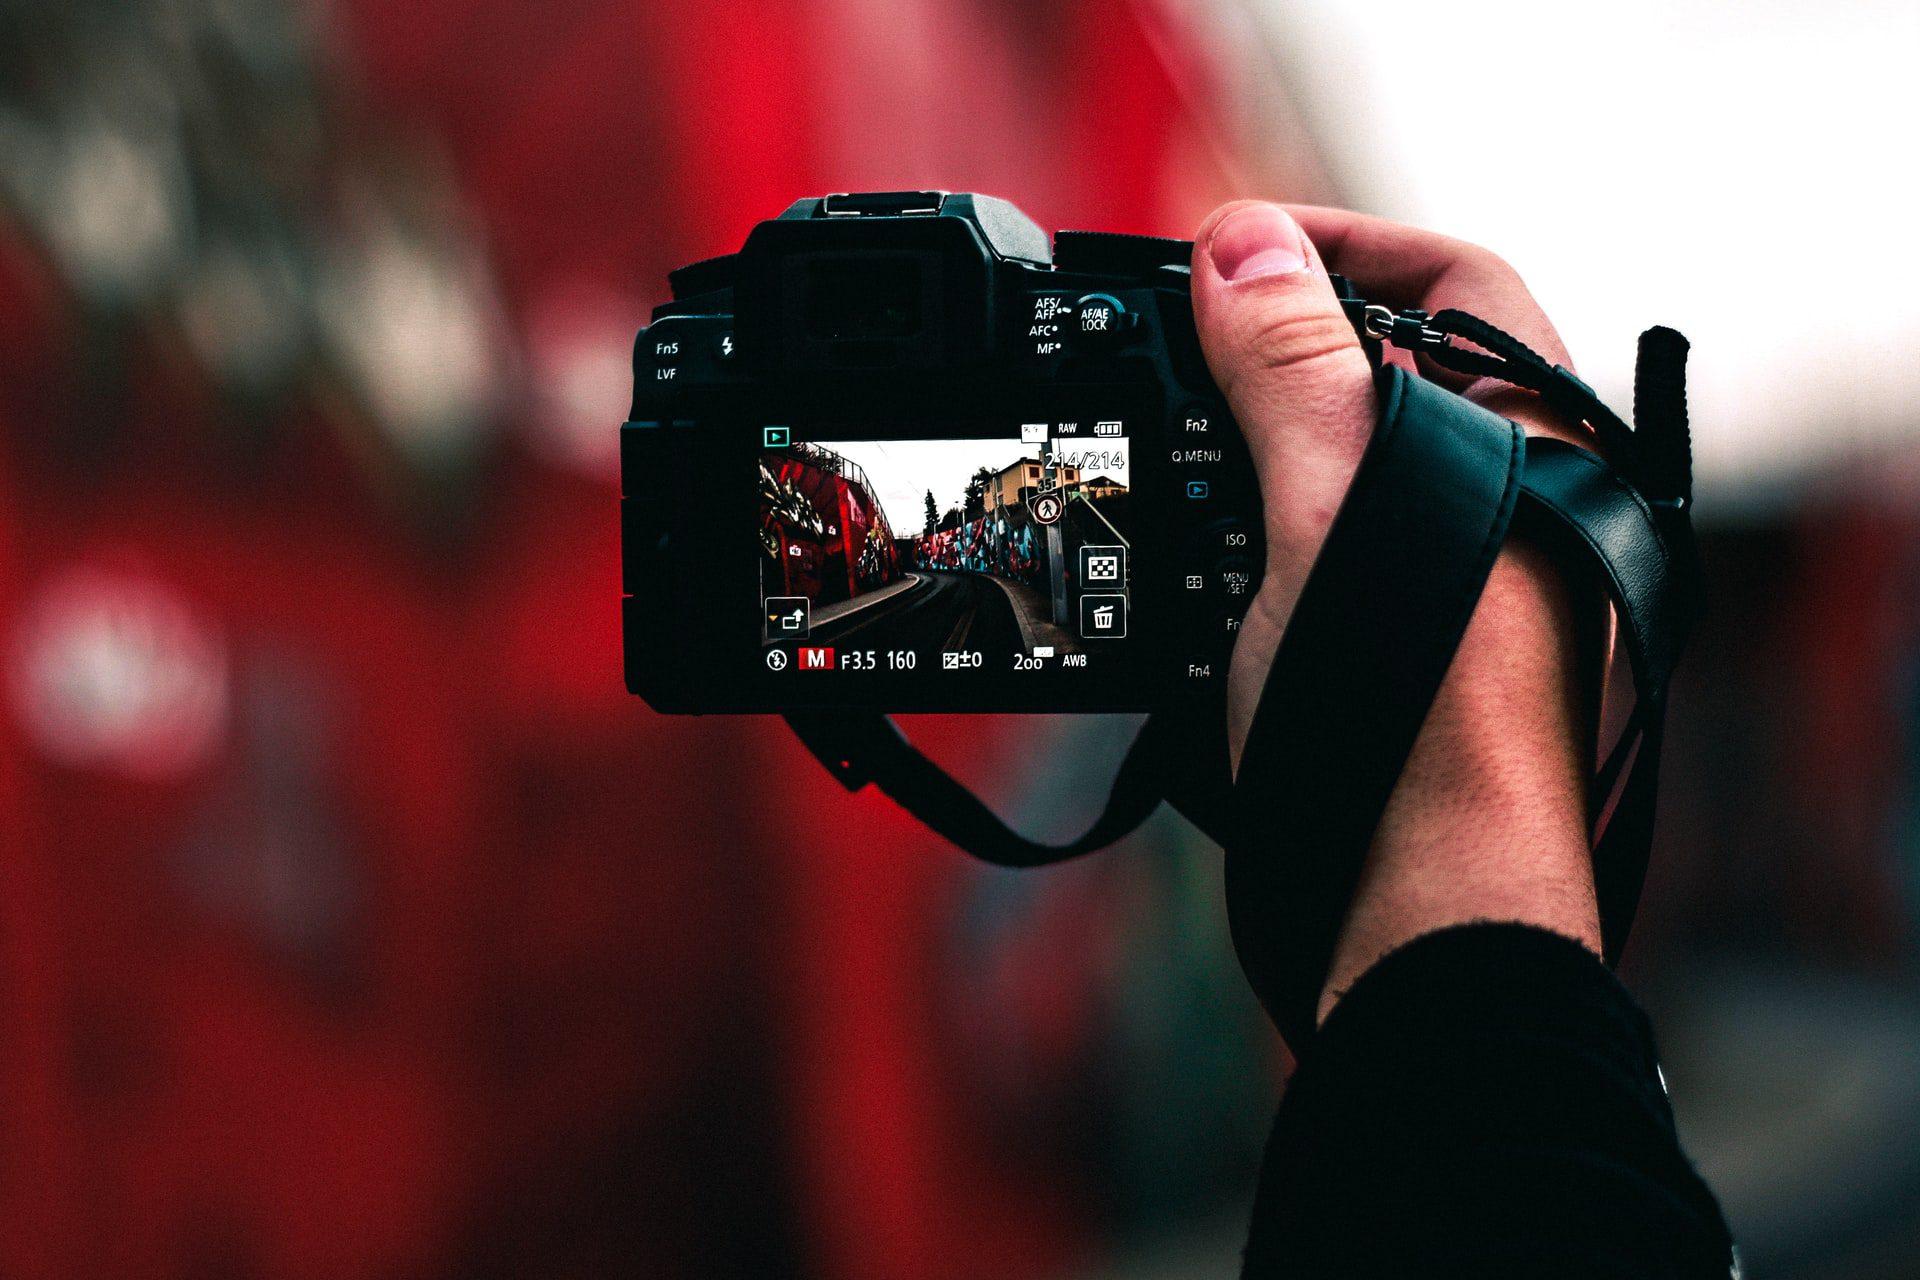 vender fotografías online